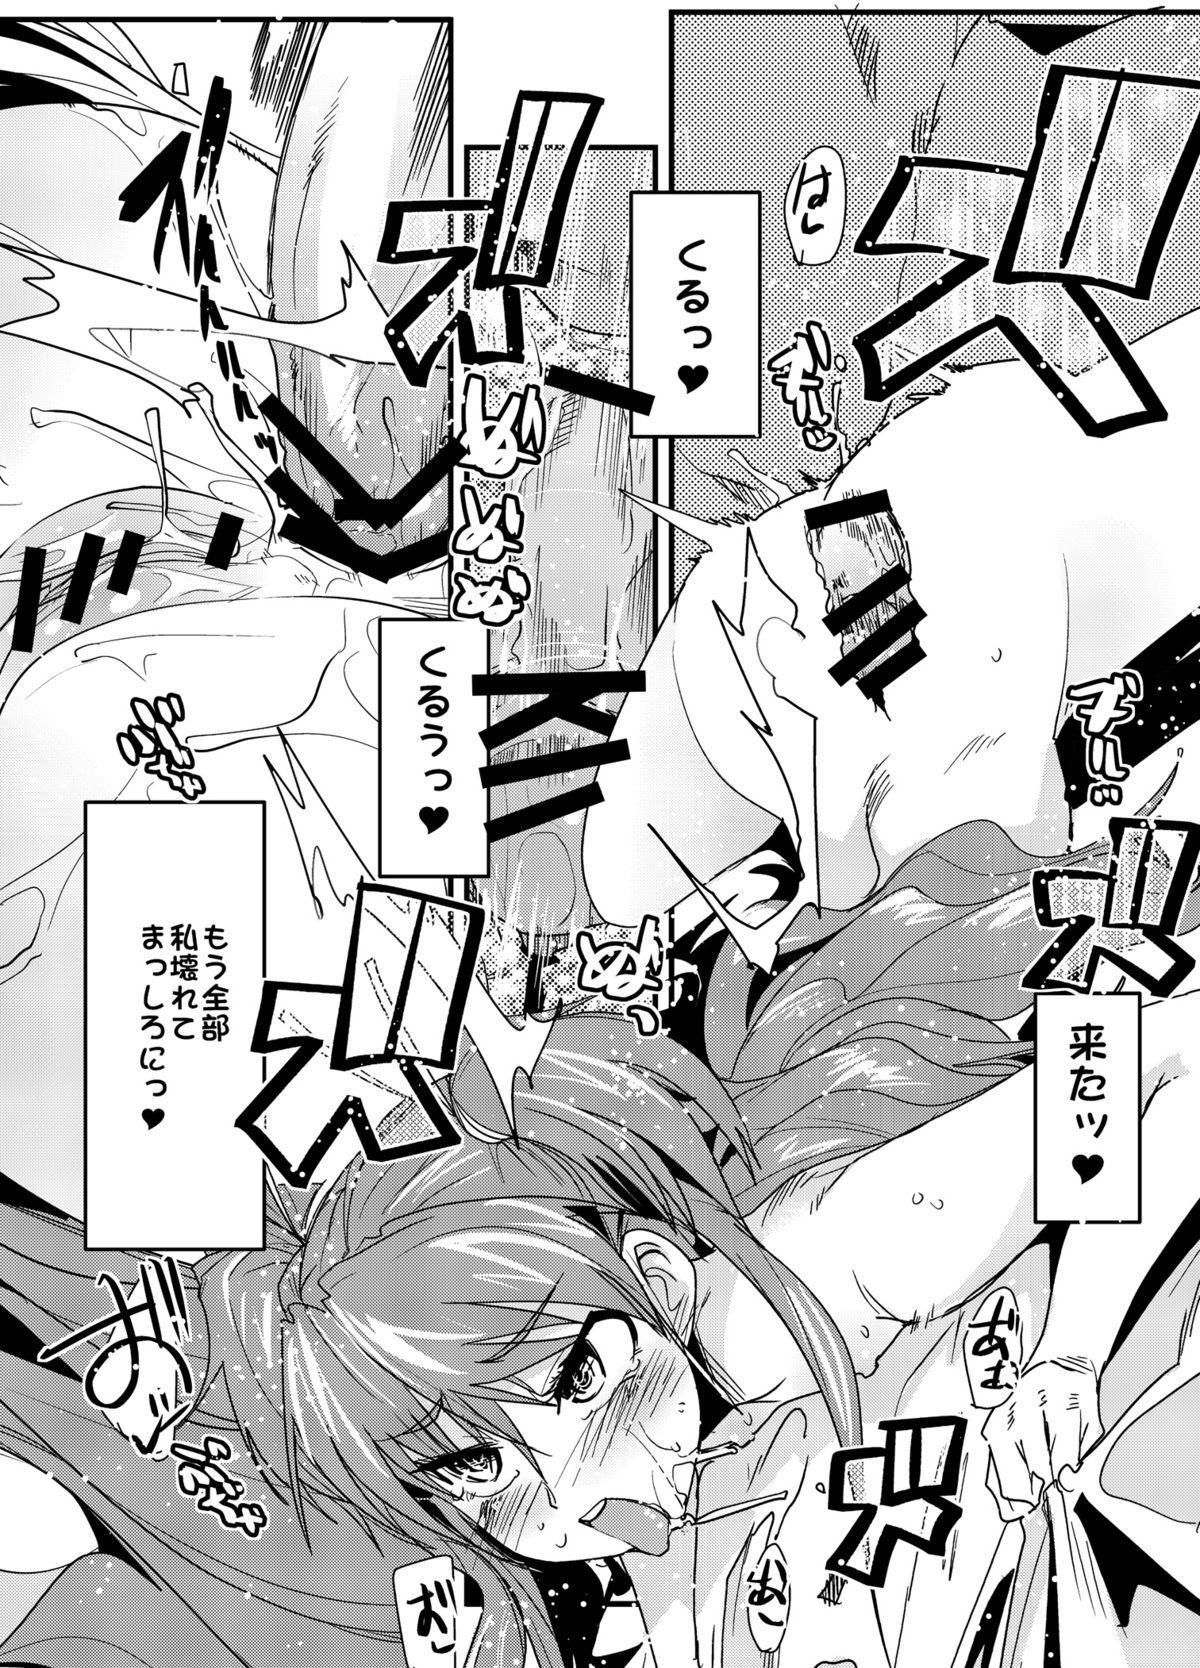 (COMIC1☆5) [Bronco Hitoritabi (Uchi-Uchi Keyaki)] Yoru ni hibiku - Sounds at night - JP (Suite Precure ) 16